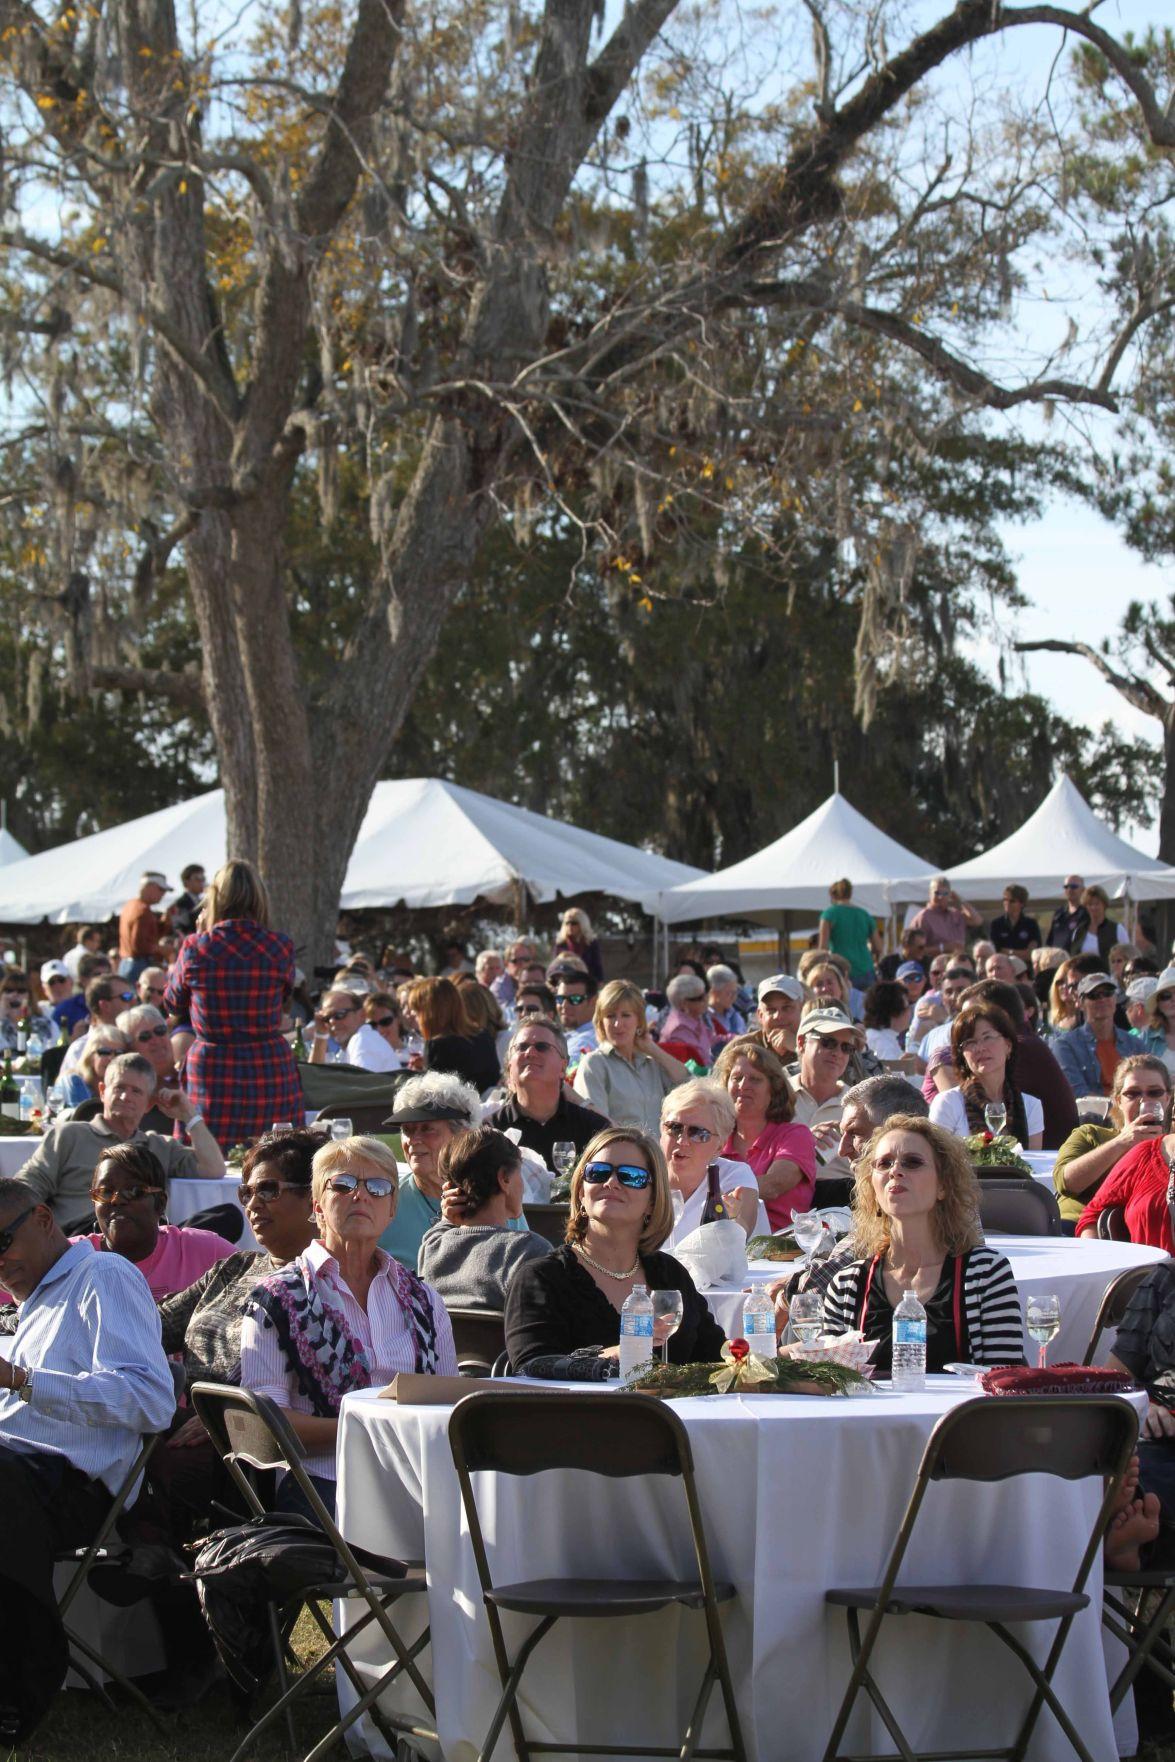 My Charleston Weekend: Dec. 5-11